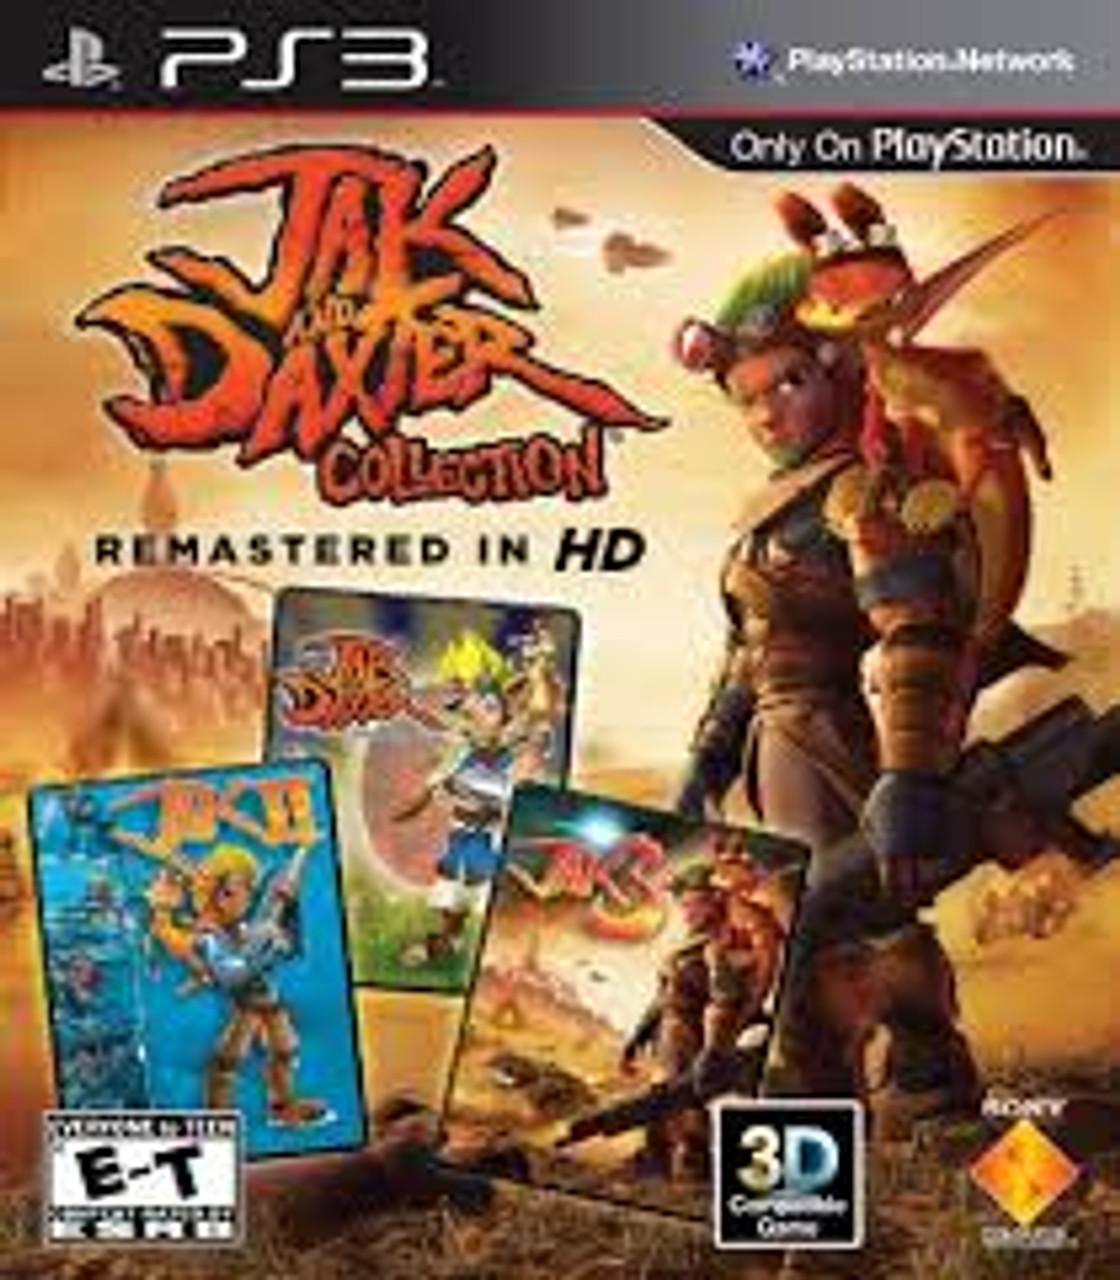 JAK & DAXTER COLLECTION - PS3